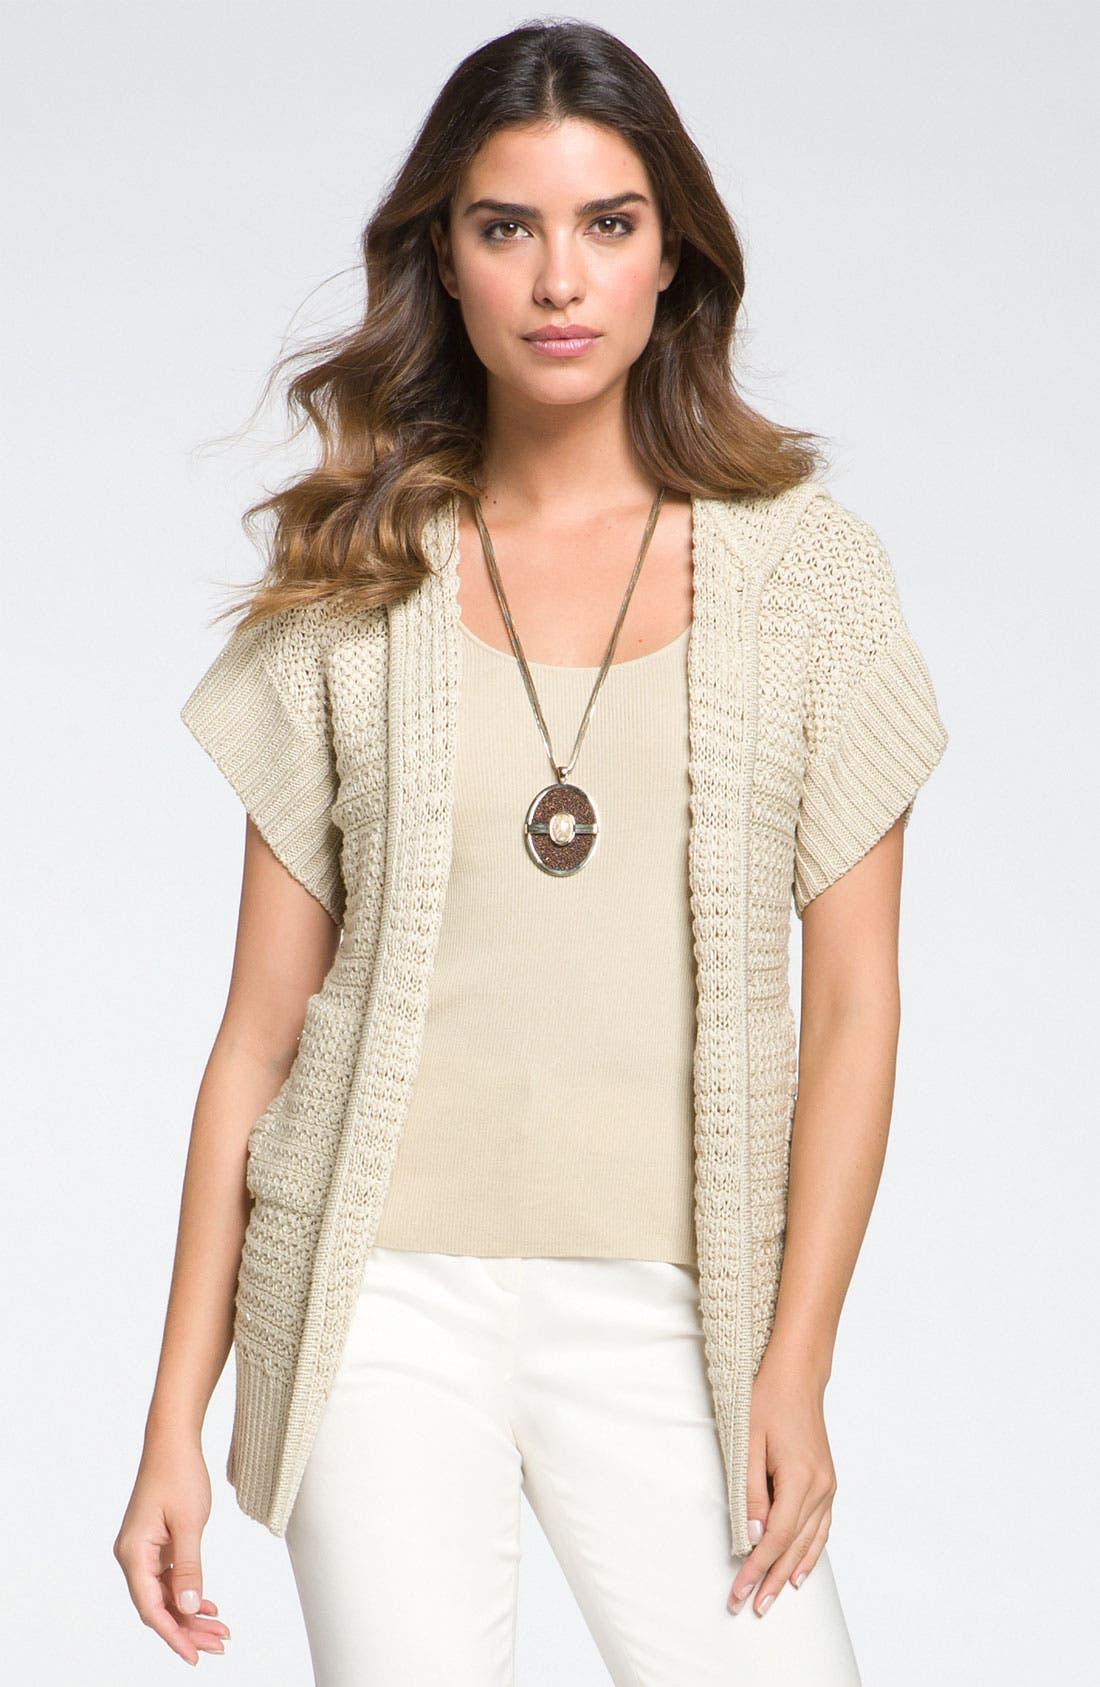 Main Image - St John Yellow Label Textured Knit Hooded Cardigan